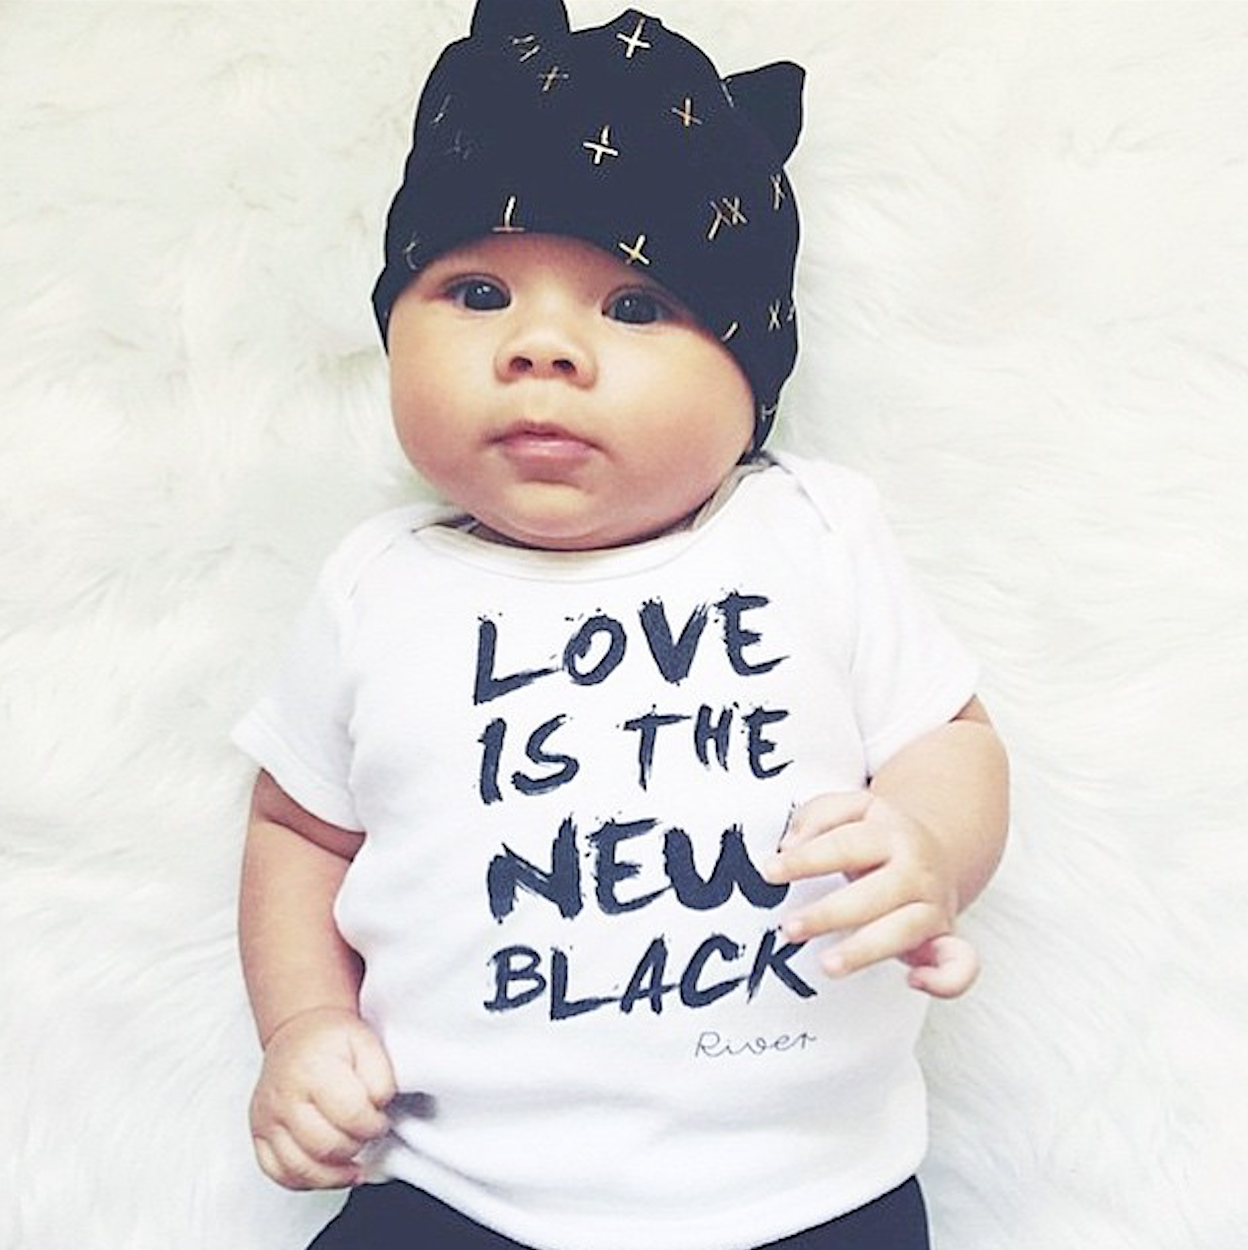 LOVE IS THE NEW BLACK onesie for River - @2princesand1prinny @wordonbaby